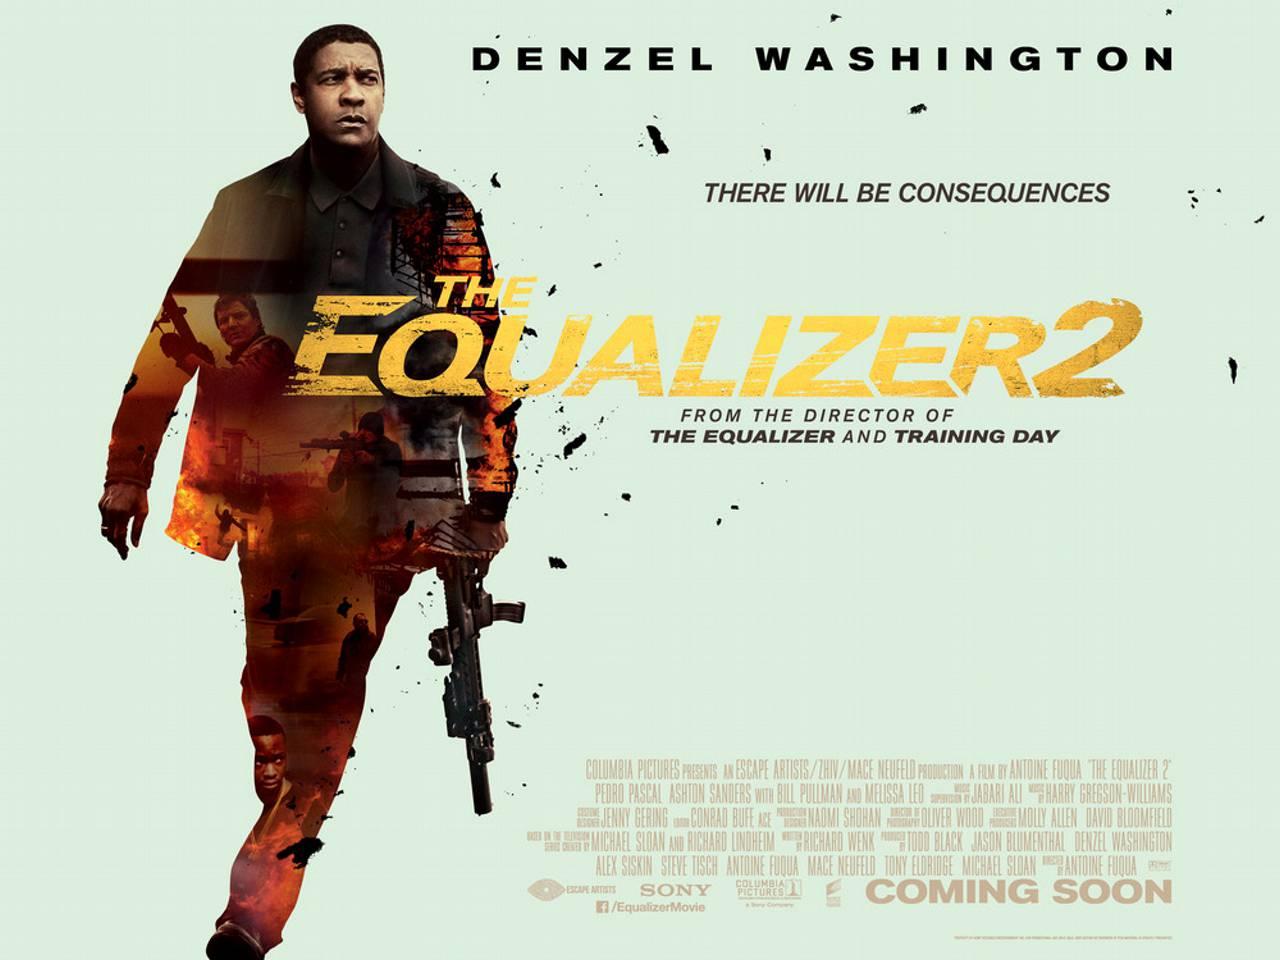 New UK poster for The Equalizer 2 starring Denzel Washington